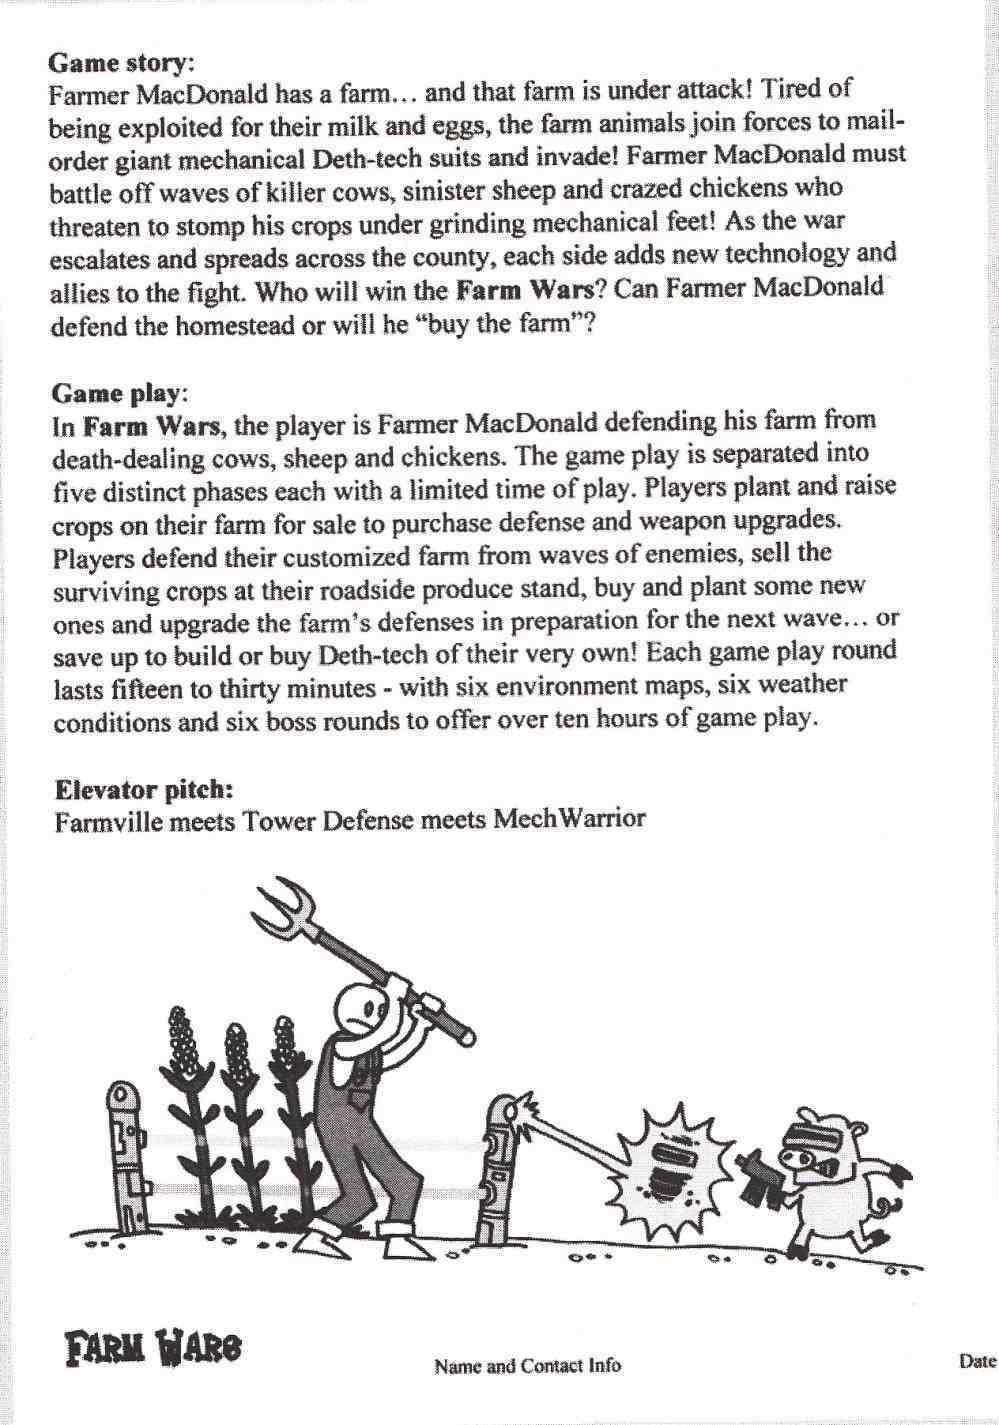 game design cover letter - Maco.palmex.co